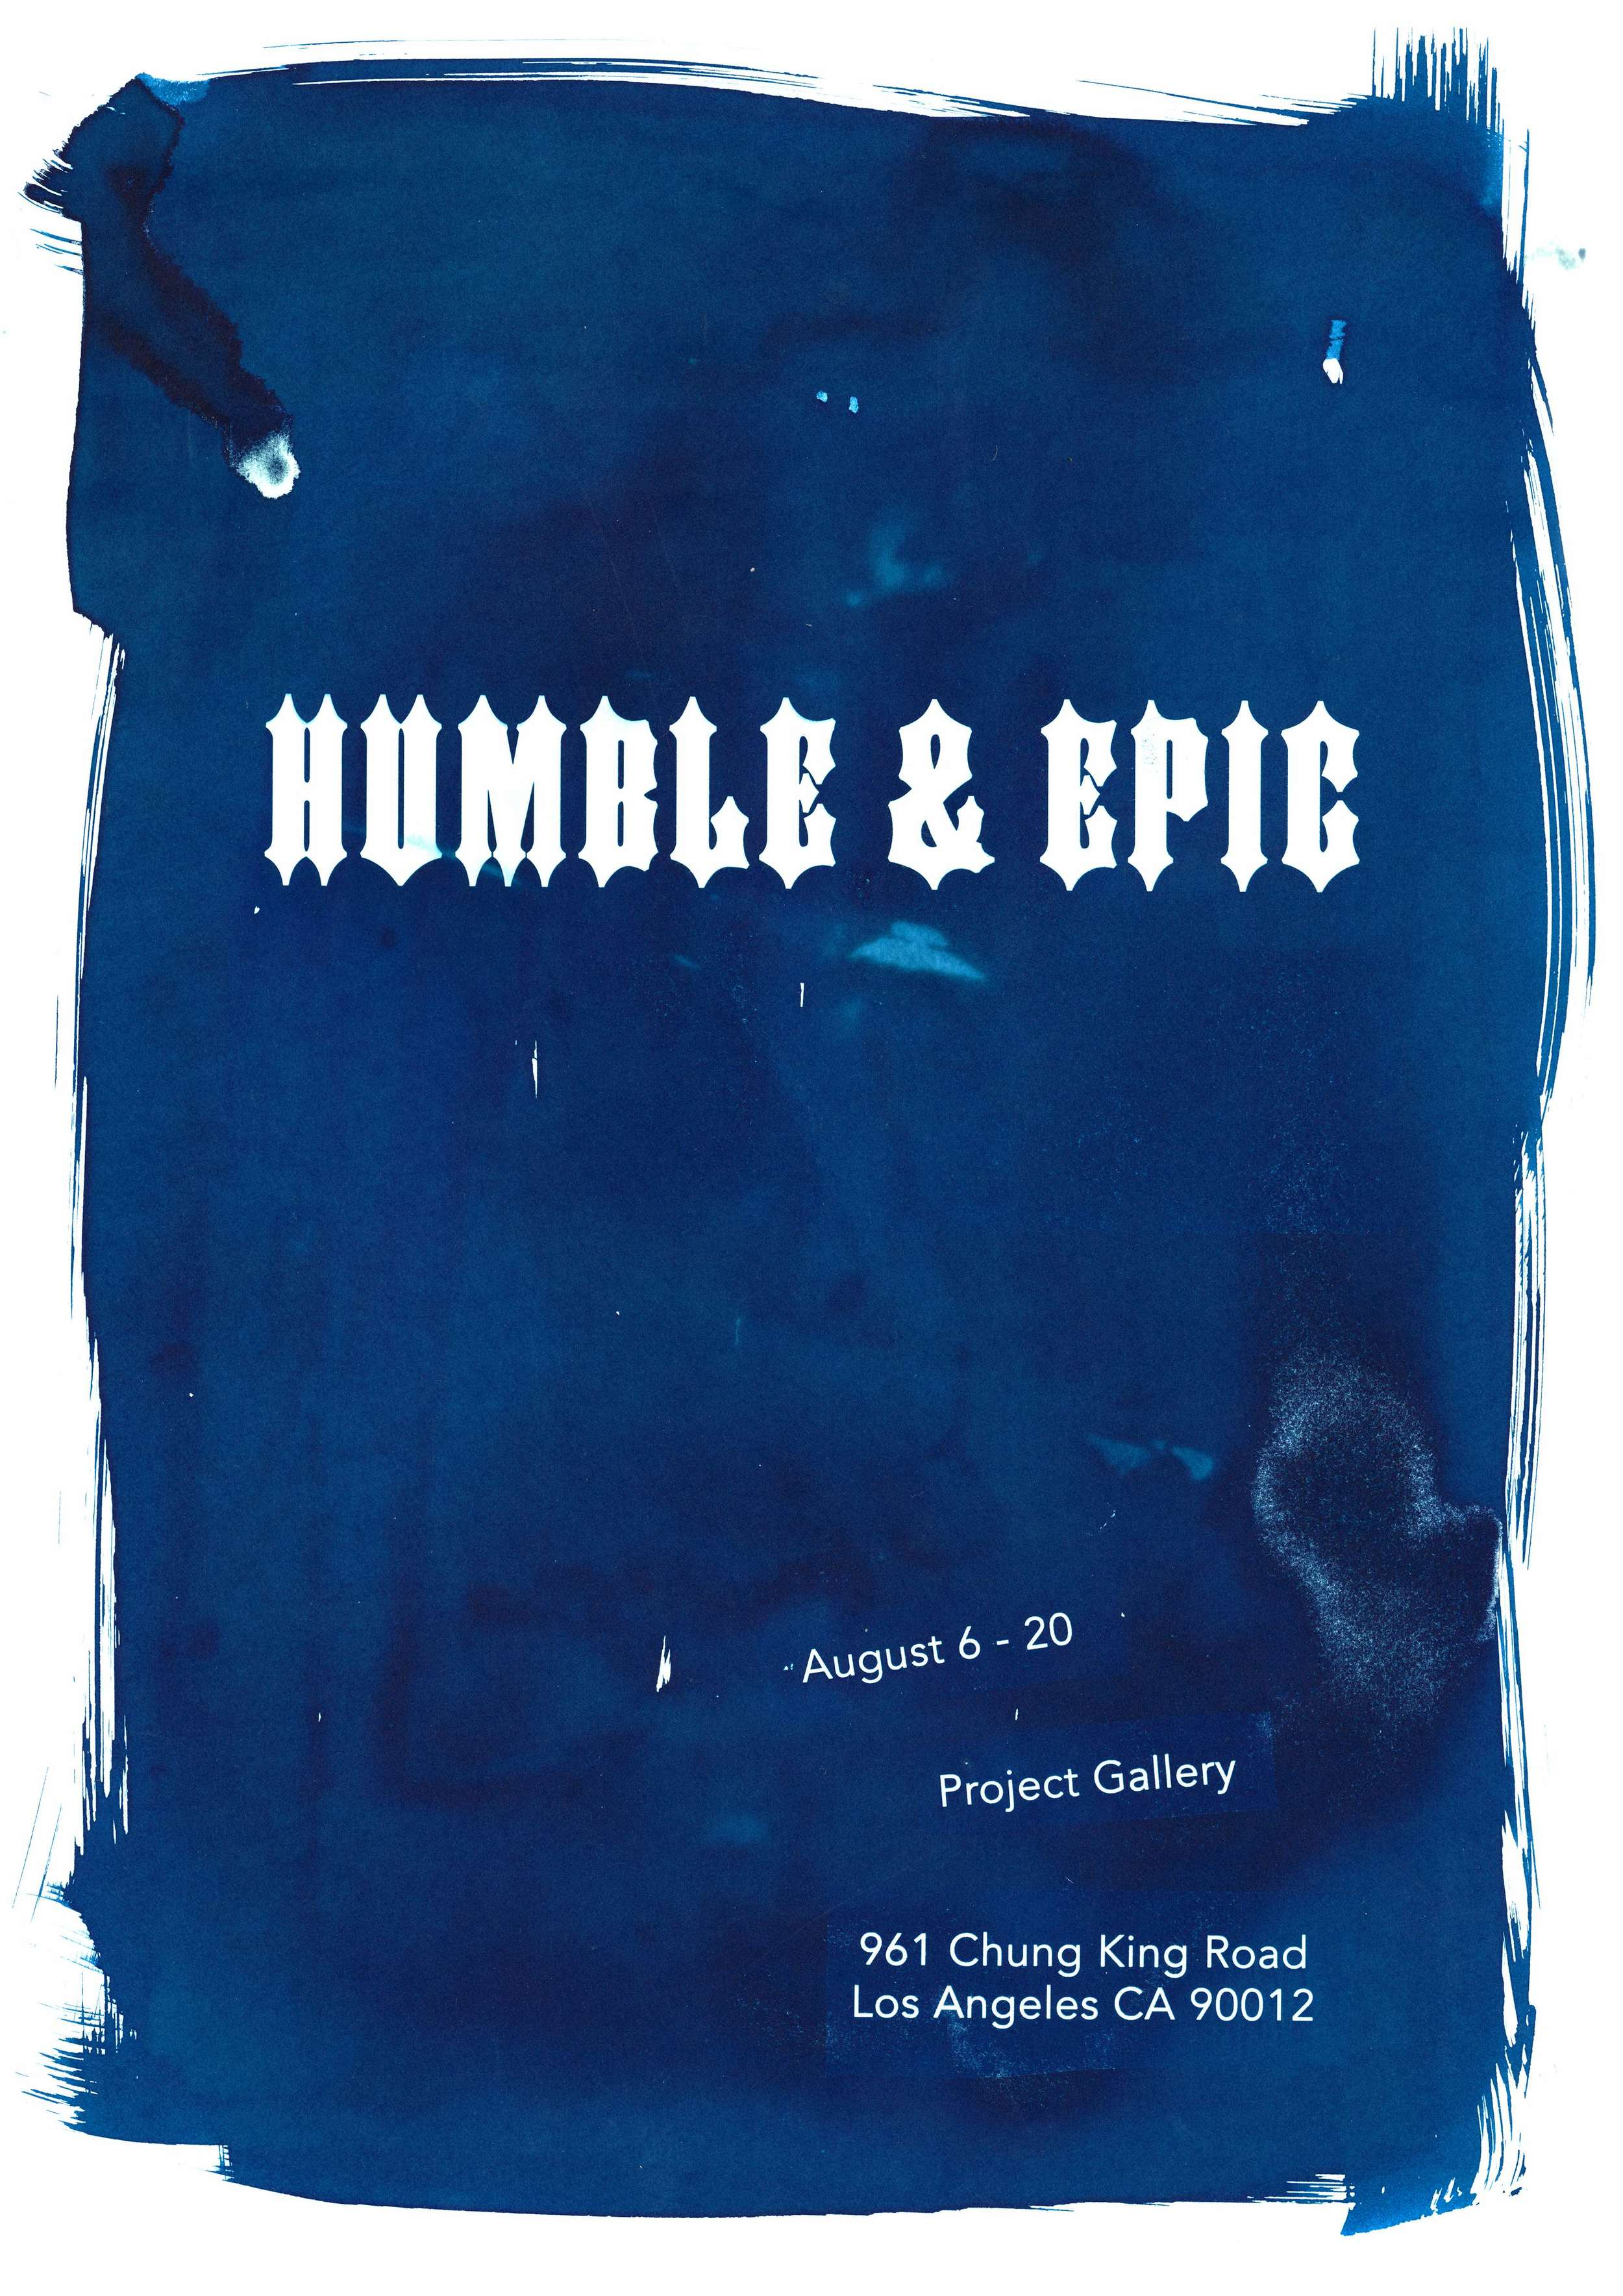 HUMBLE_EPIC_BLUE_200dpi.jpg